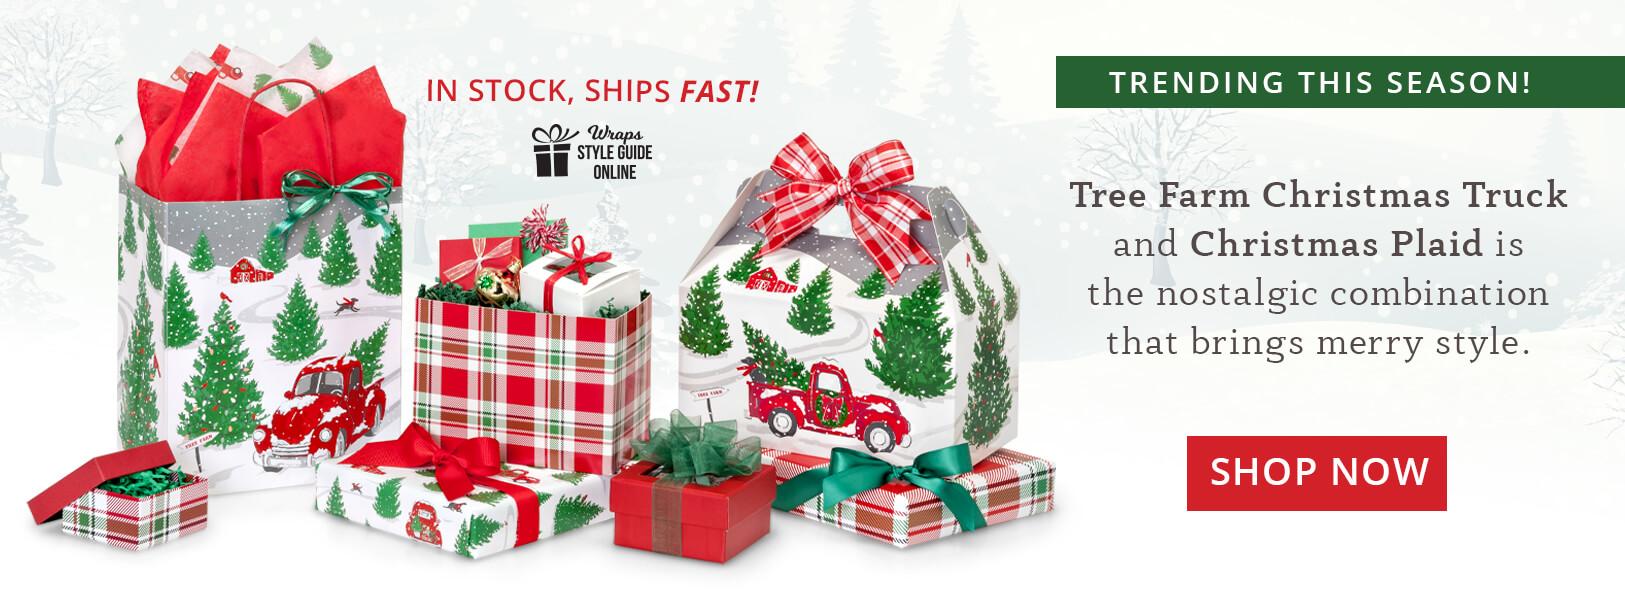 Christmas Tree Farm Truck from Nashville Wraps